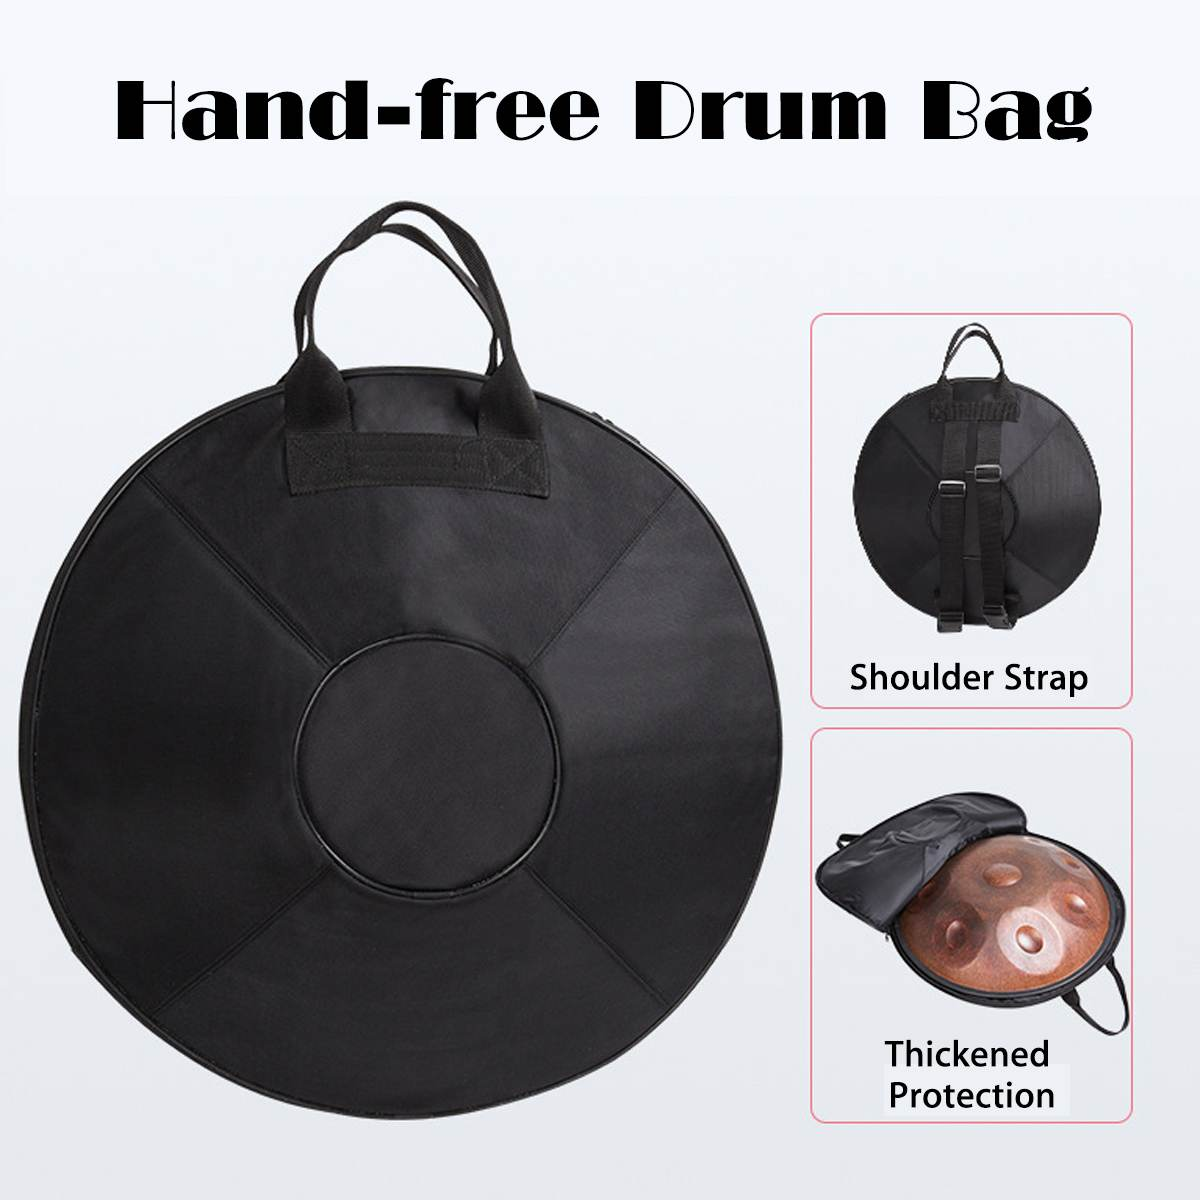 hand drum bag protection handpan case cover black thicken hand bag cover shoulder straps bags. Black Bedroom Furniture Sets. Home Design Ideas